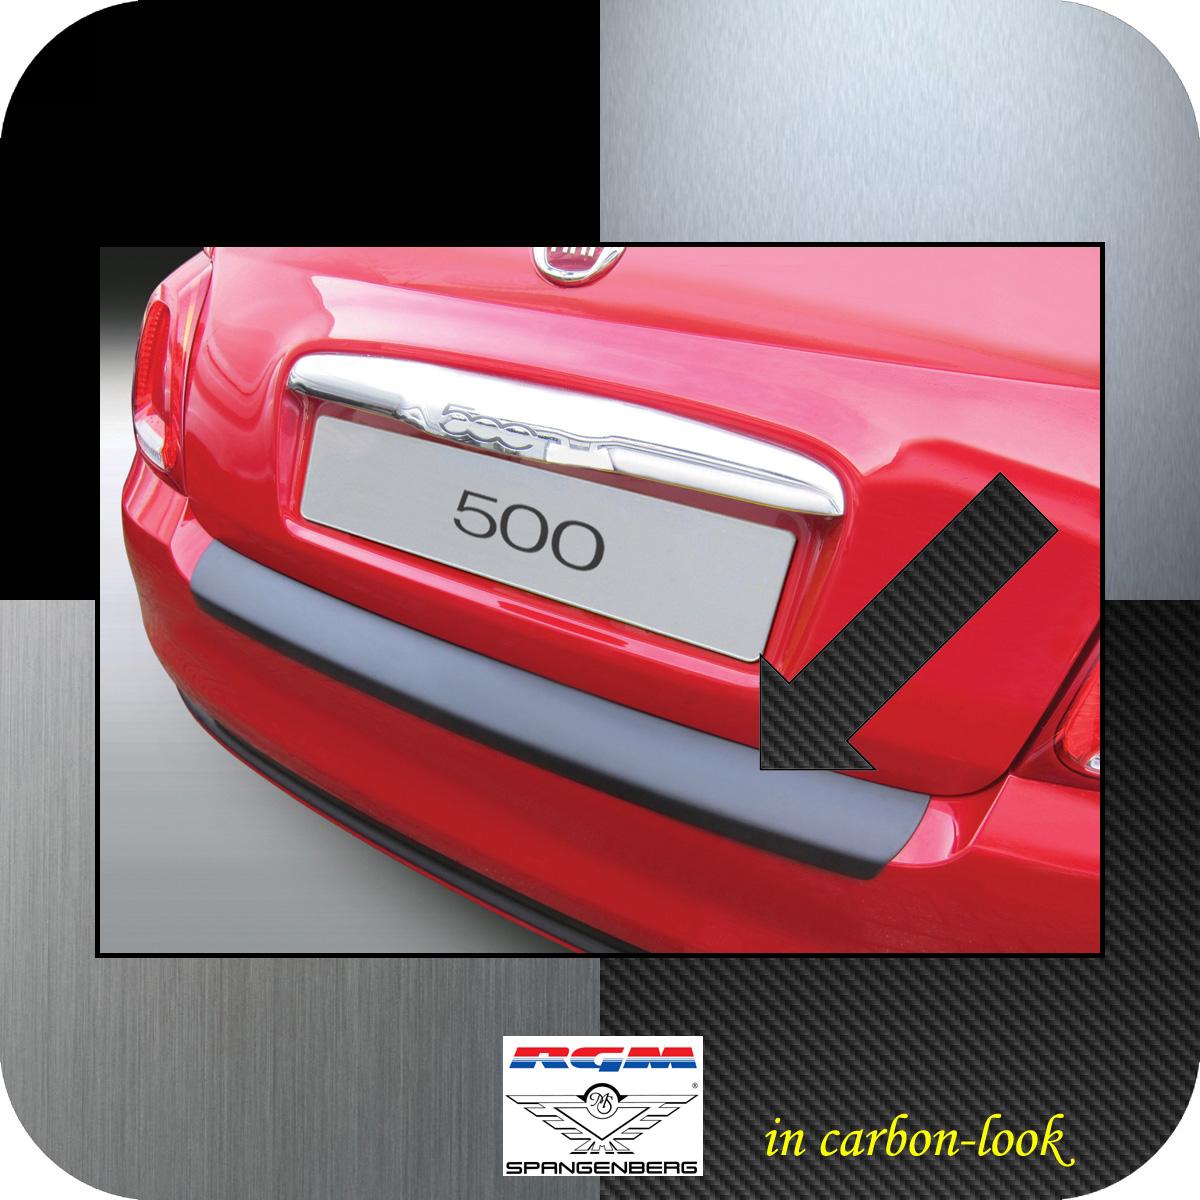 Ladekantenschutz Carbon-Look Fiat 500 ab facelift Baujahr 2015- 3509914